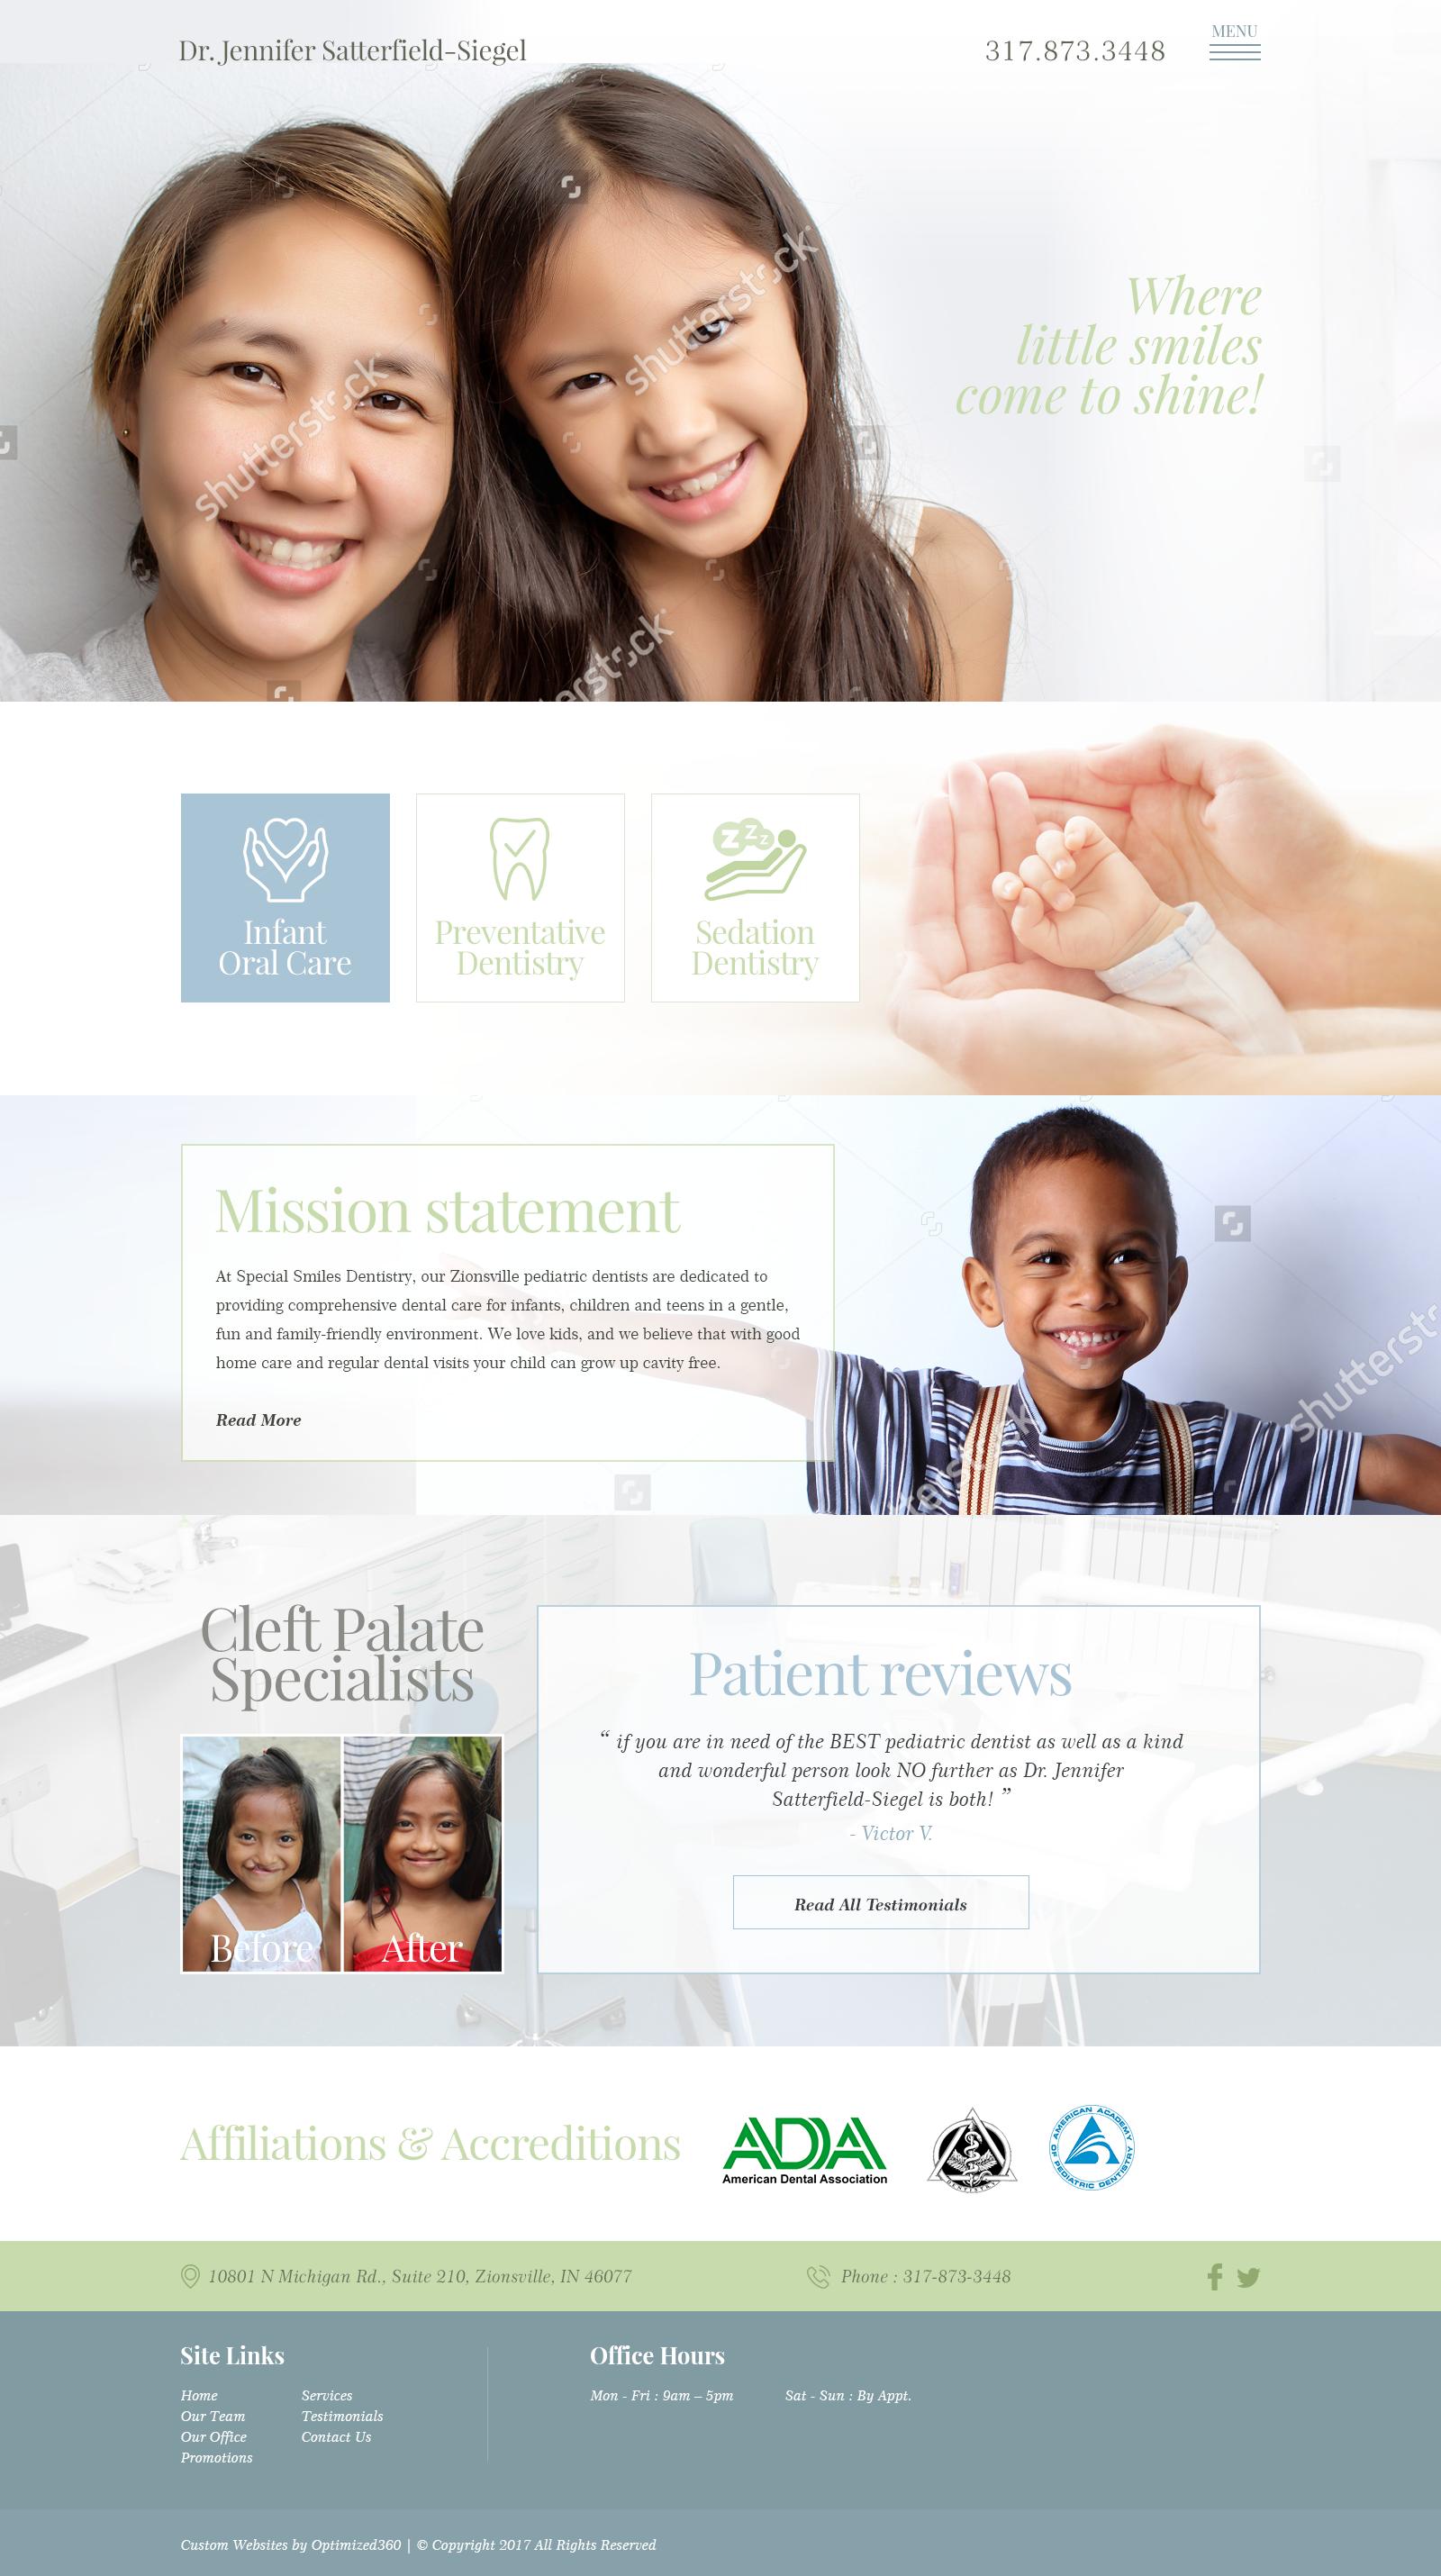 Pin By O360 On O360 Com Dental Medical Websites Pediatric Dentist Medical Websites Healthcare Professionals